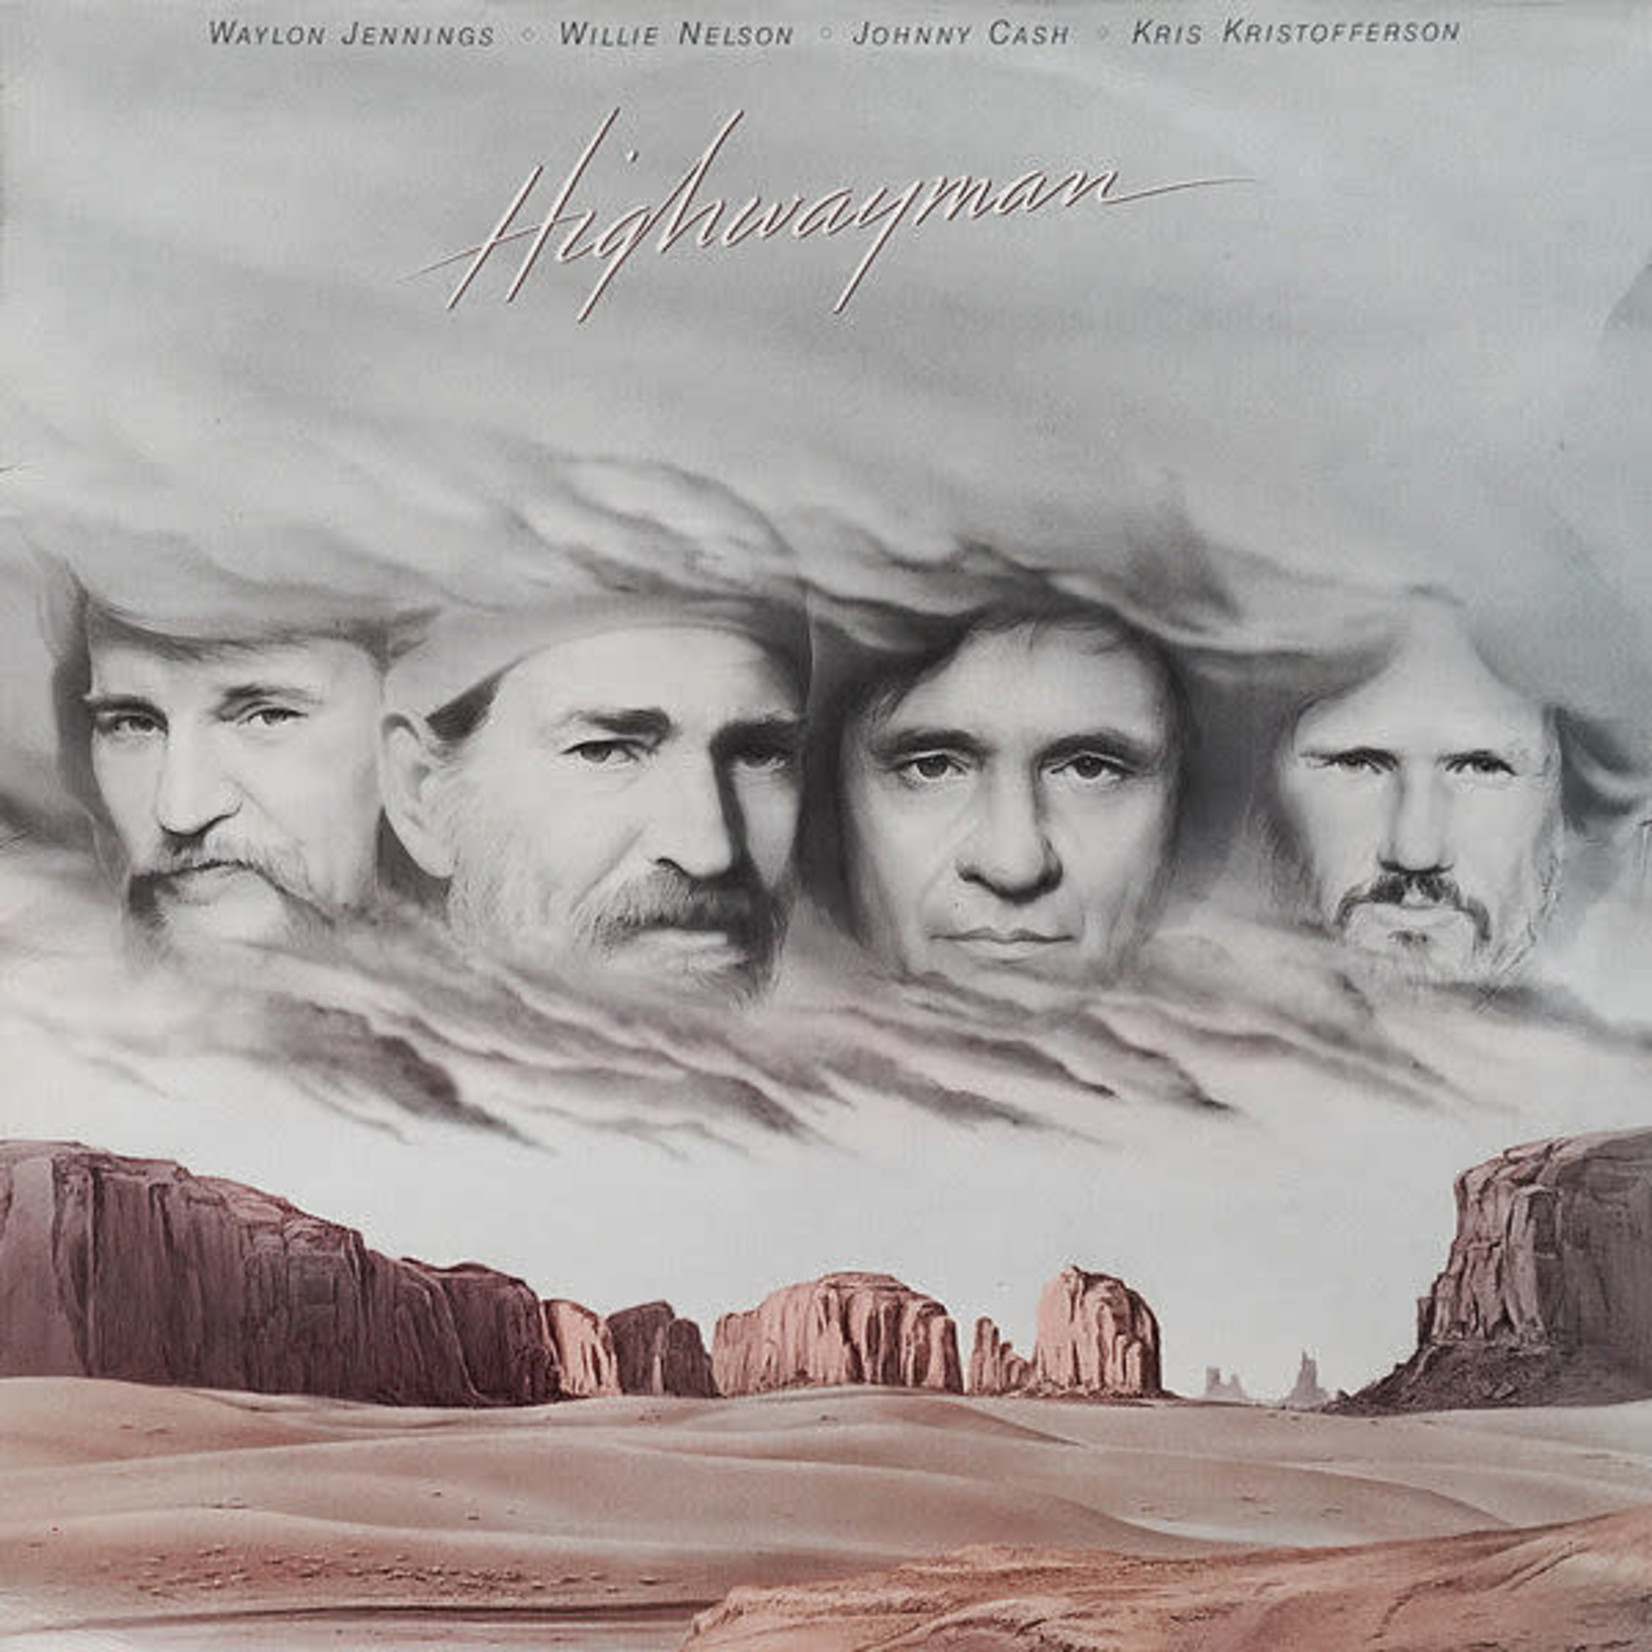 Highwaymen, The: Highwayman (CLEAR VINYL) [LP, Sundazed Music, Inc.]